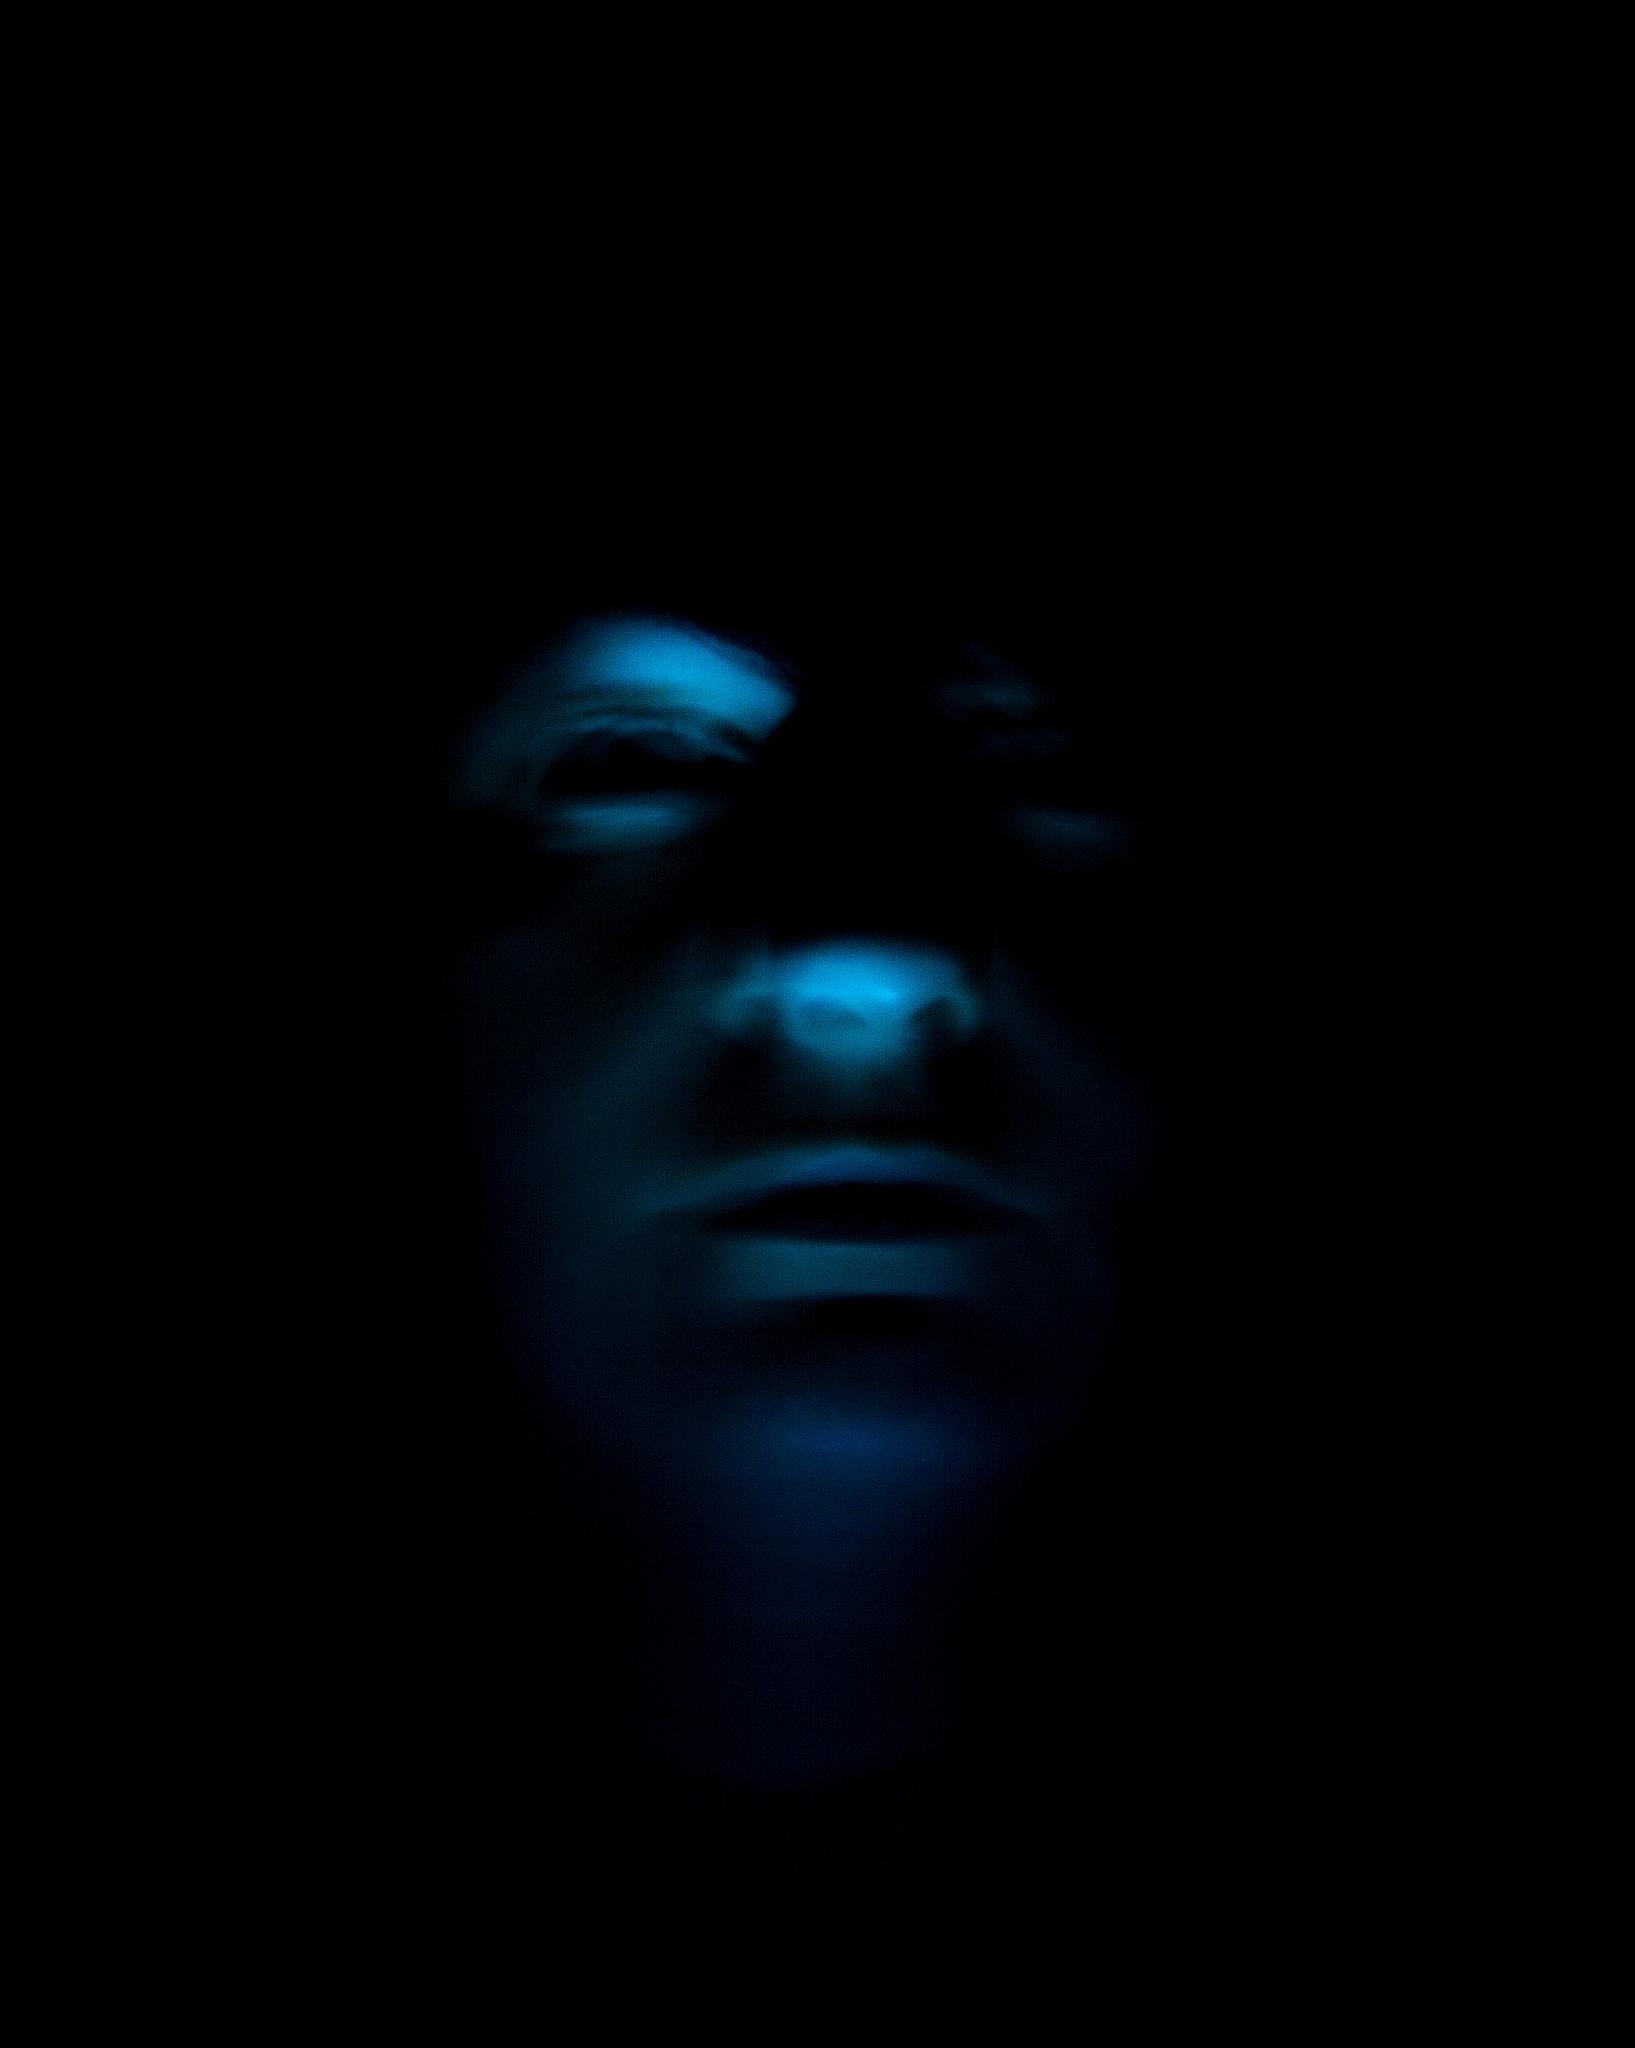 Blue by Steve Rowe